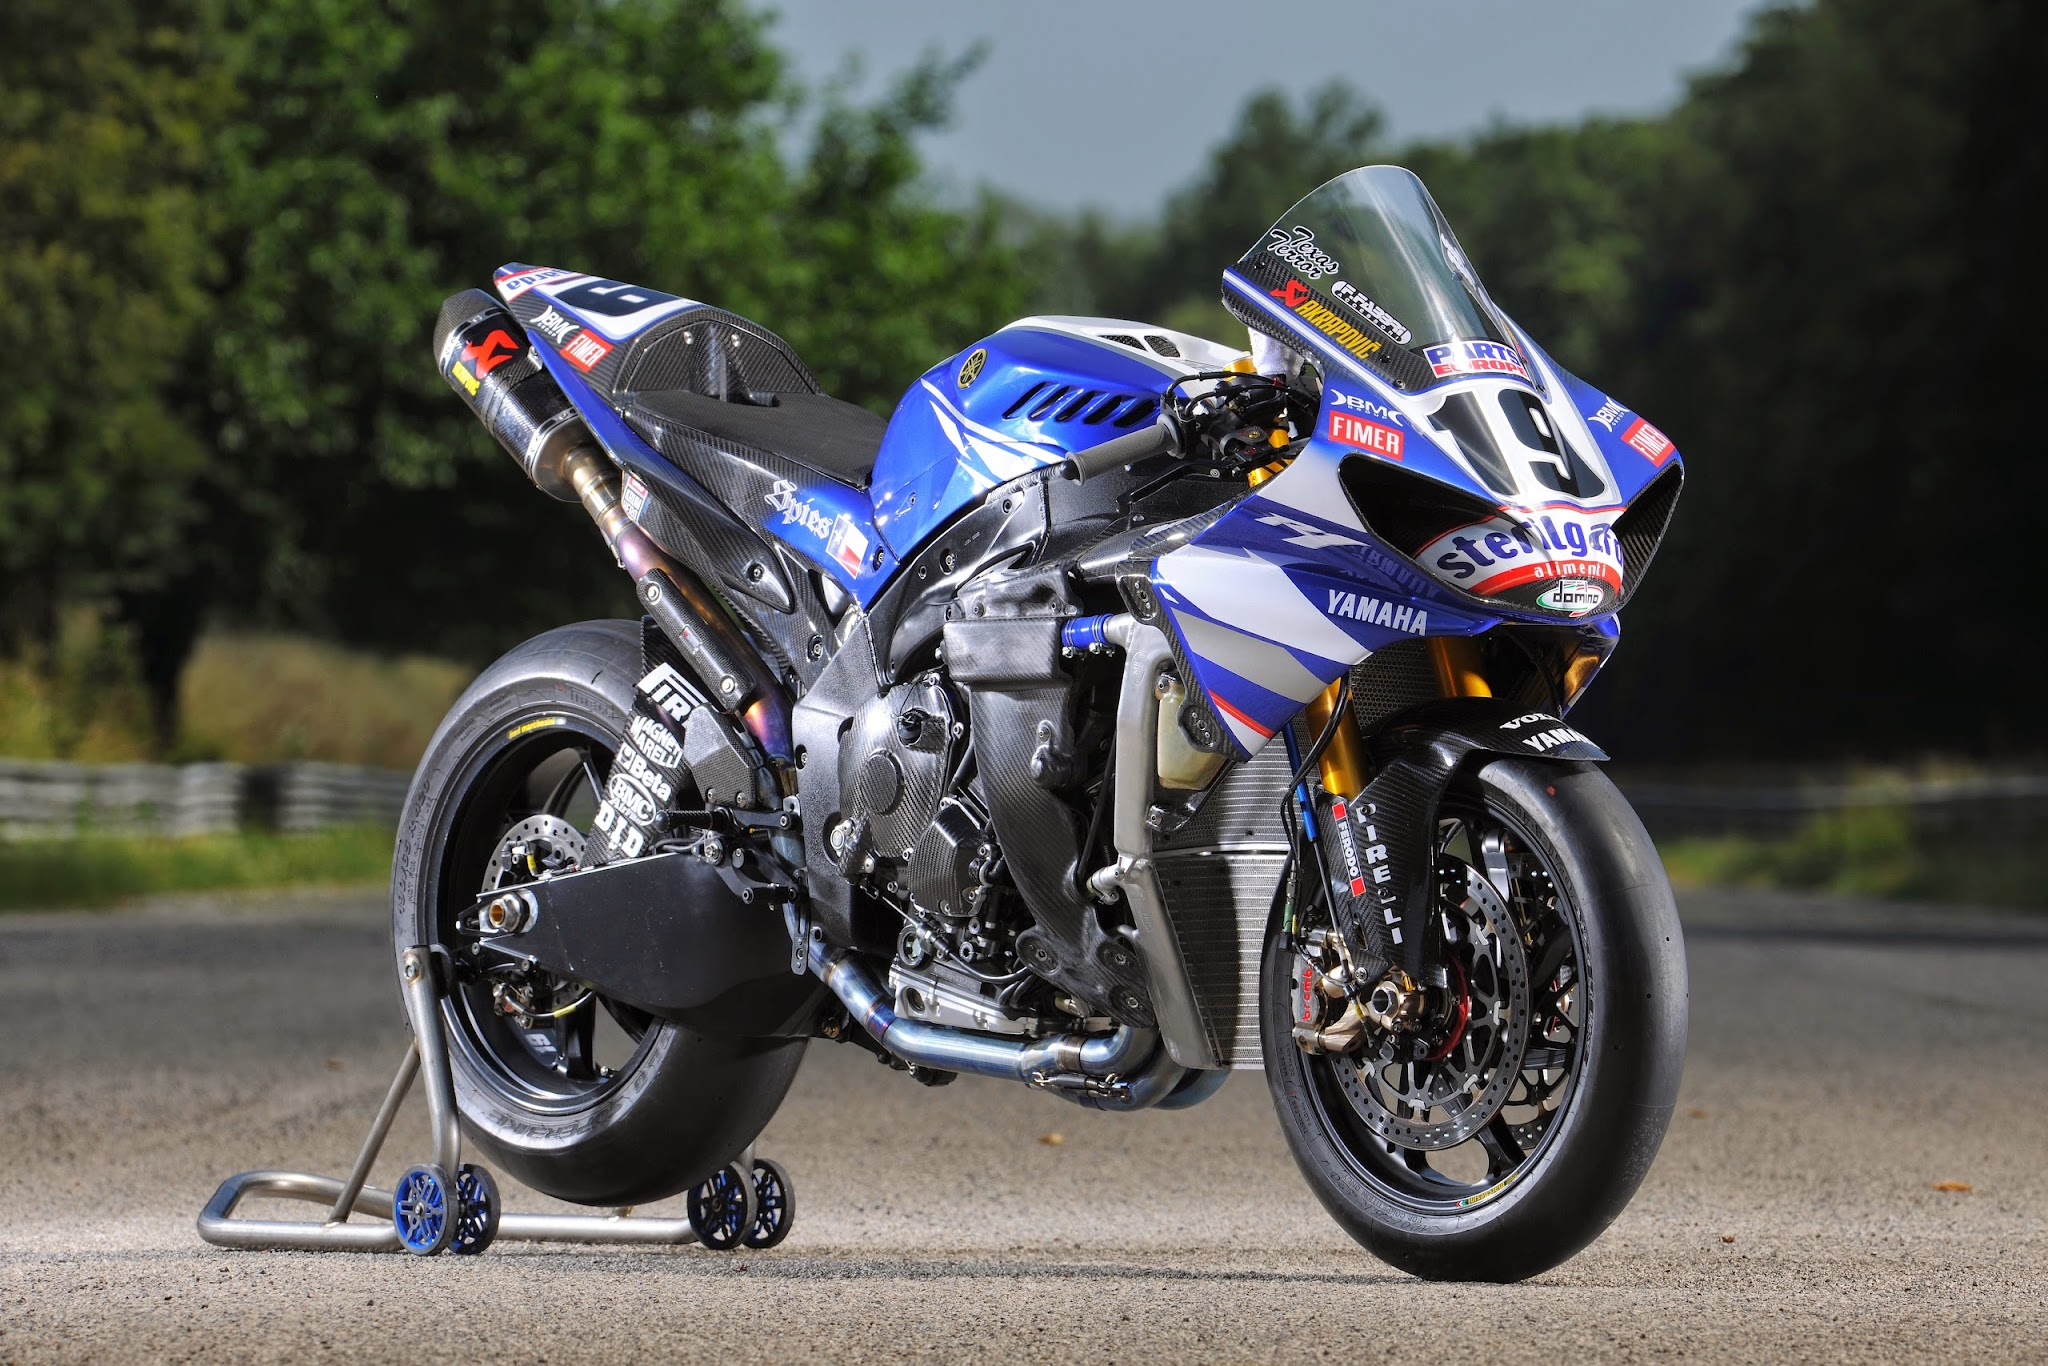 Modifikasi Kawasaki Edge Balap